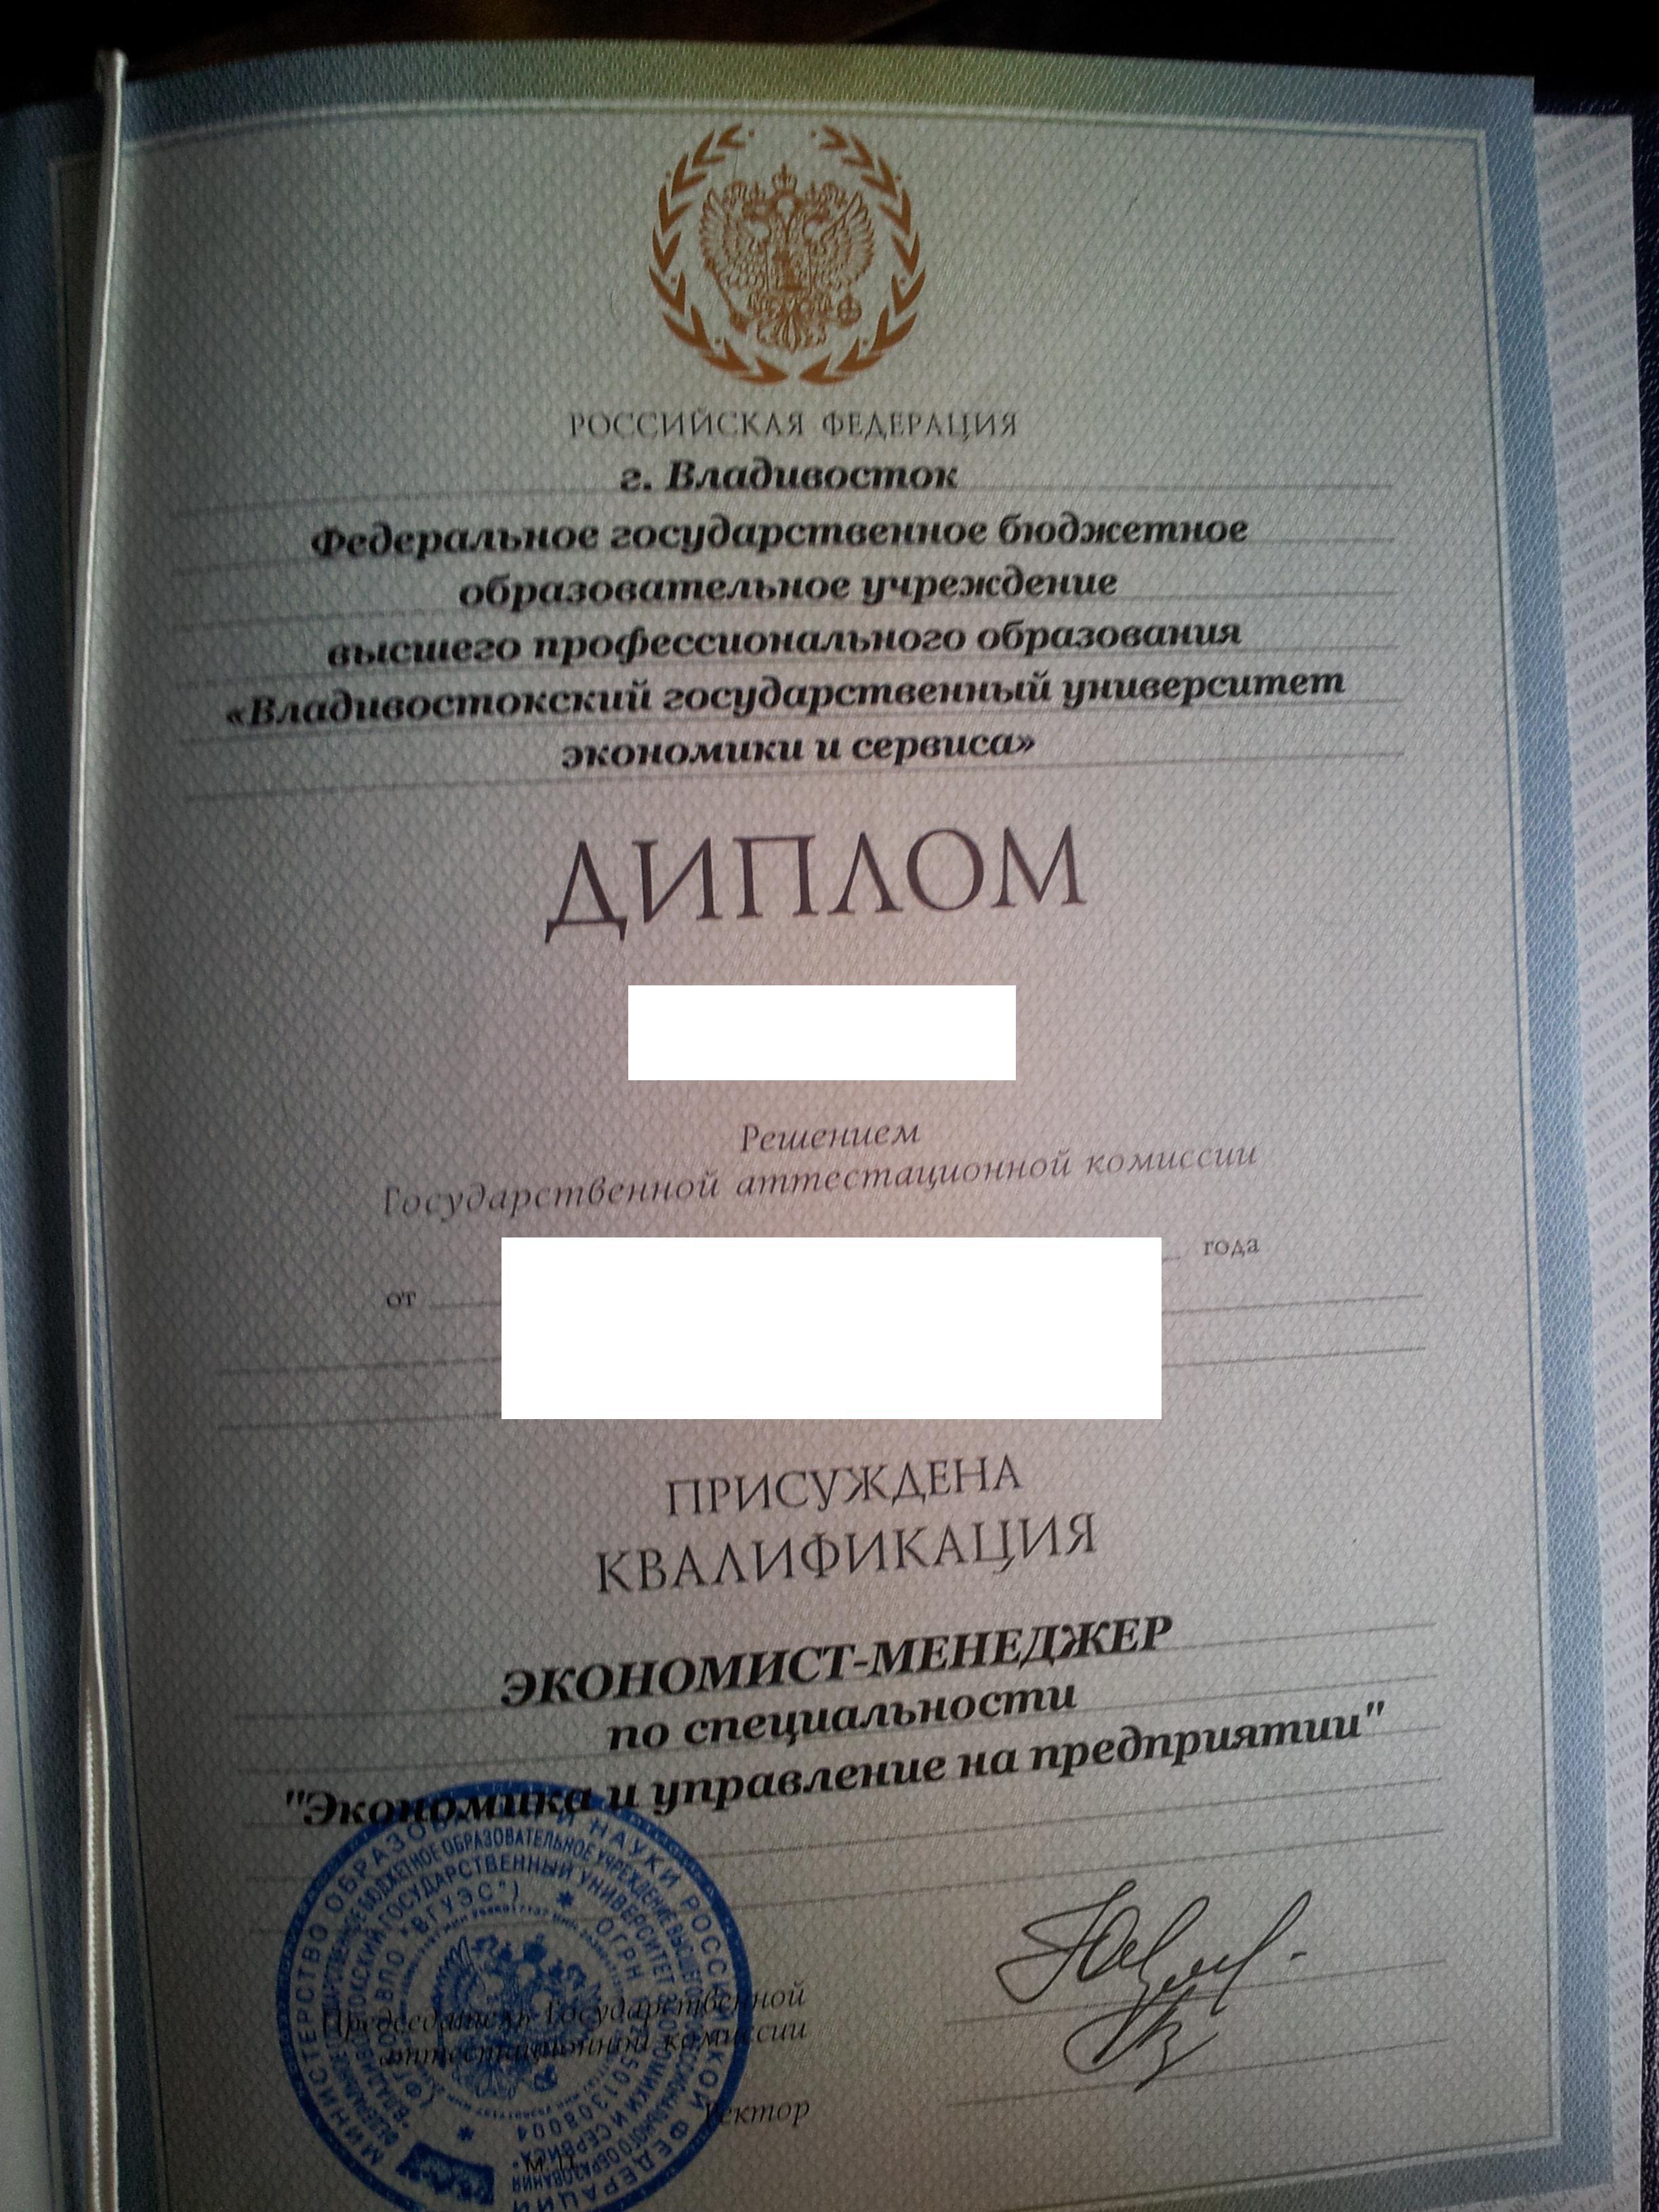 http://s4.uploads.ru/1AhlB.jpg